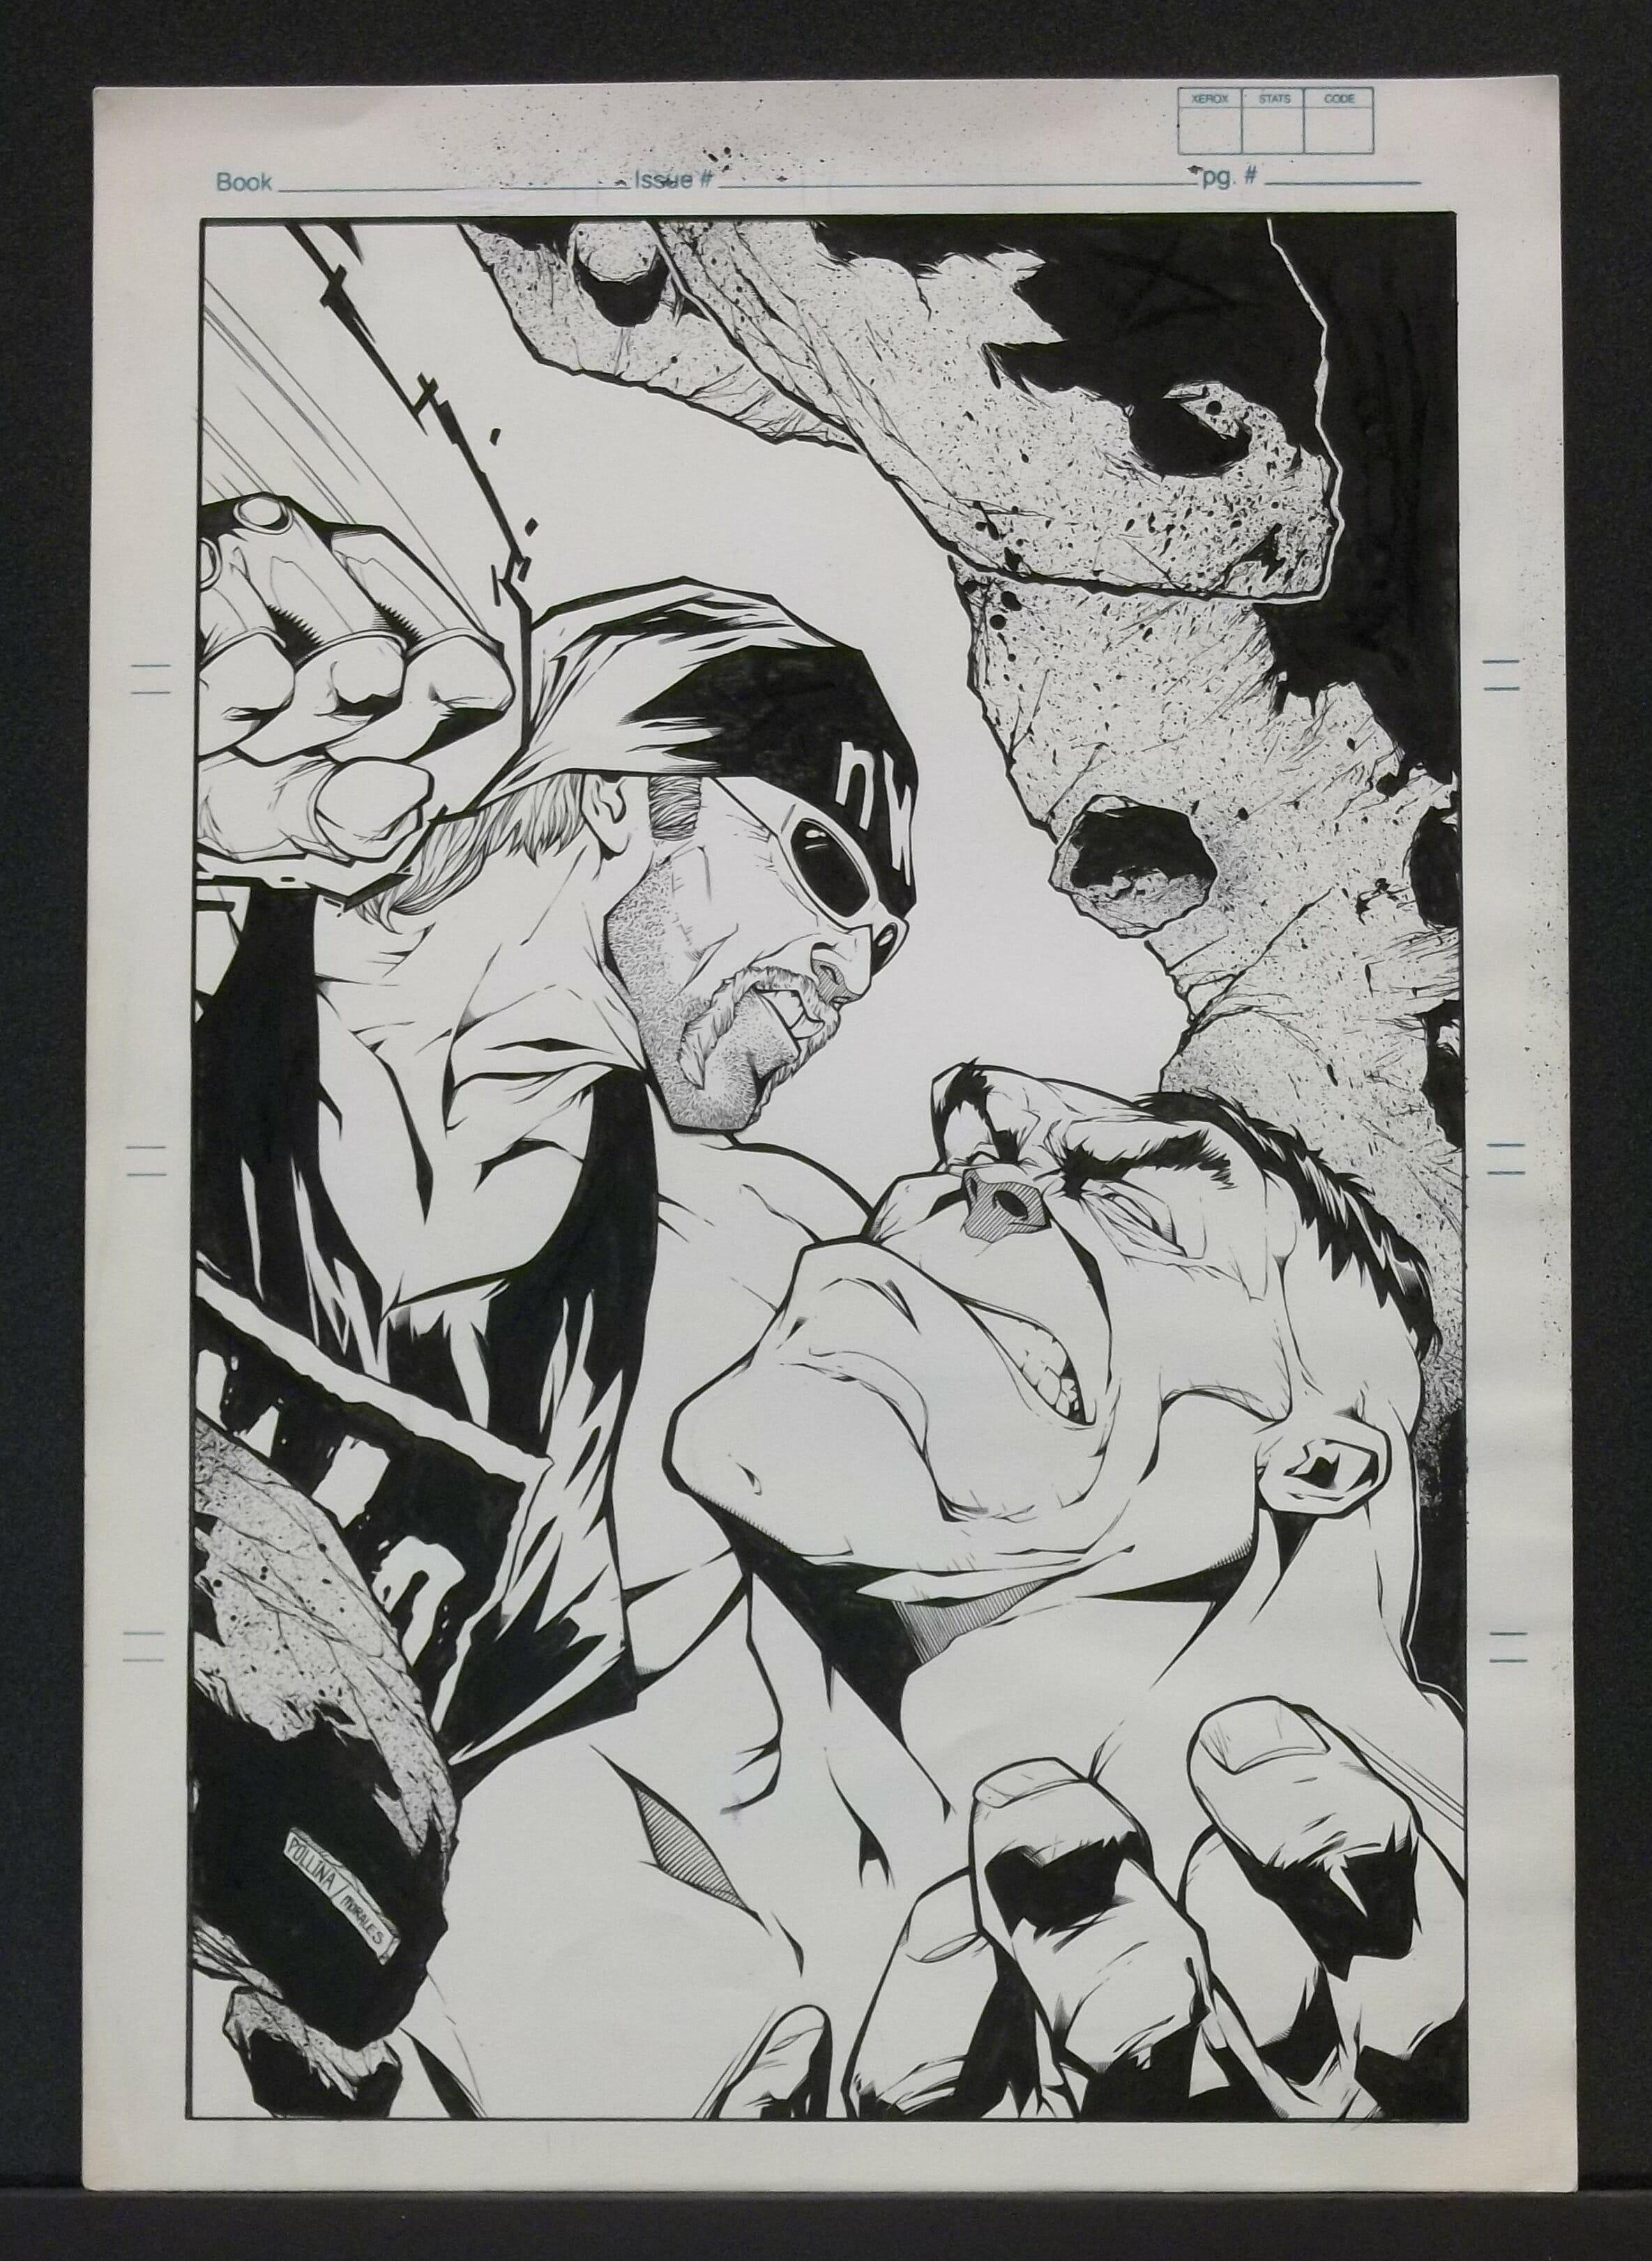 Comic book artist Adam Pollina's concept art of The Incredible Hulk squaring off against WCW's Hollywood Hulk Hogan.